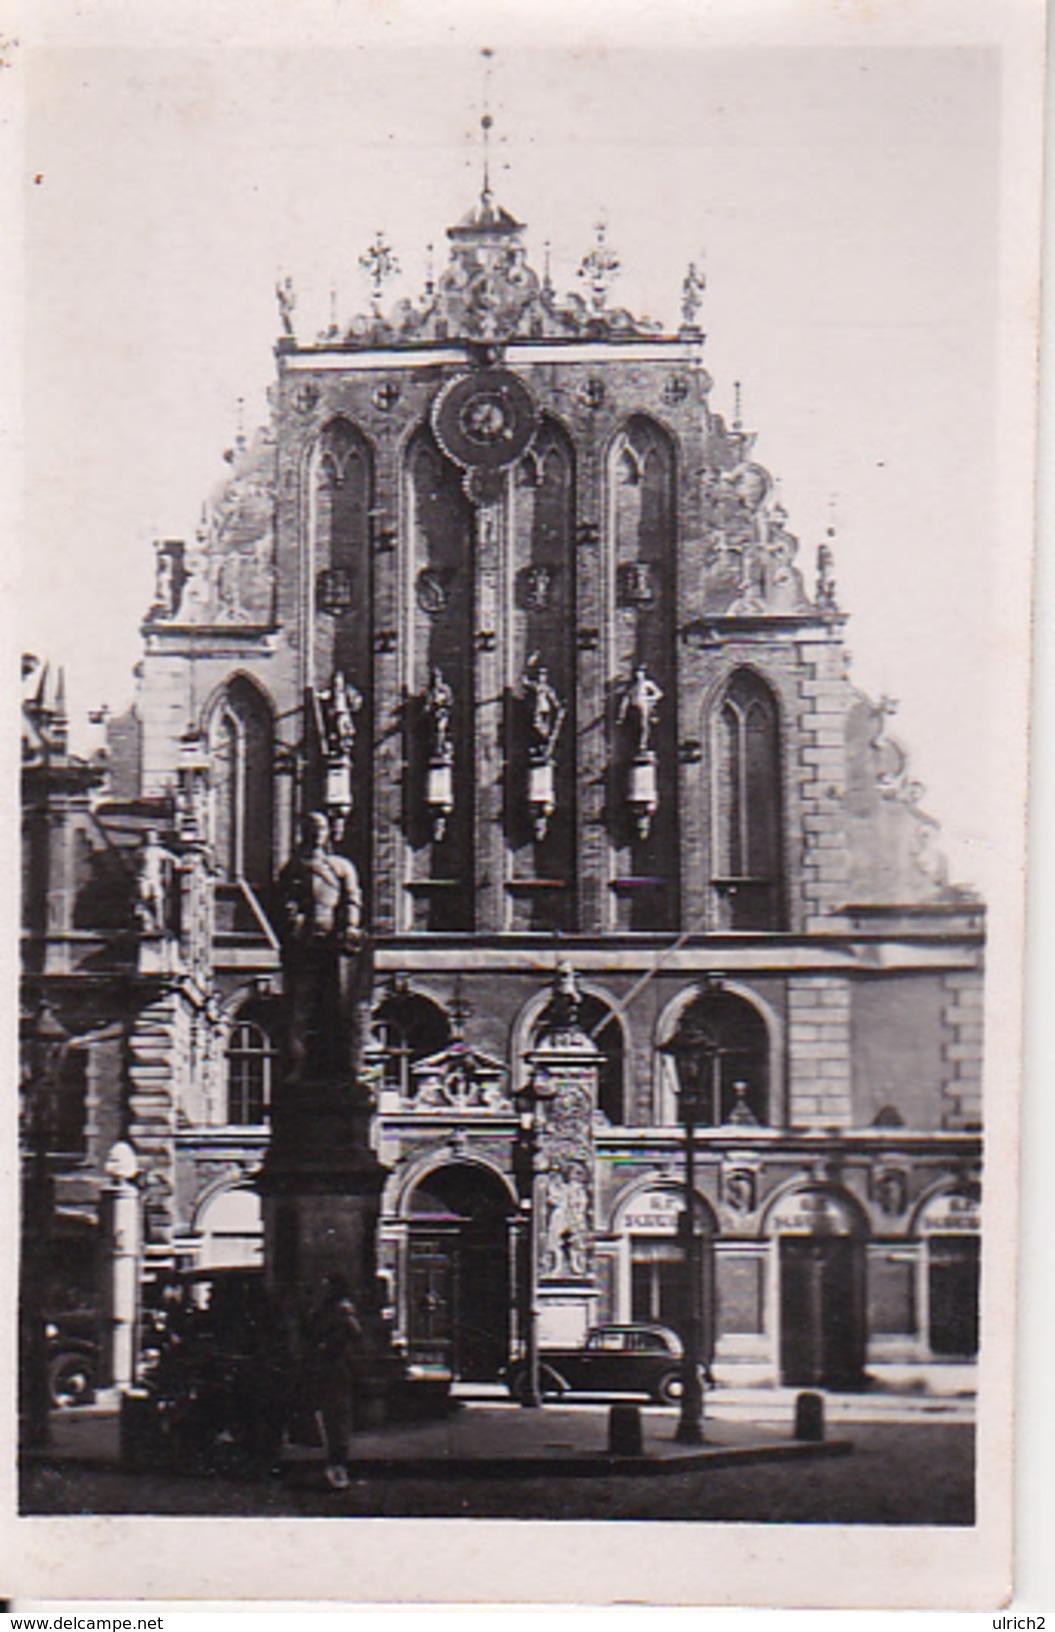 Foto Riga - Roland - Schwarzhäupterhaus - Ca. 1940 - 8*6cm (27588) - Orte